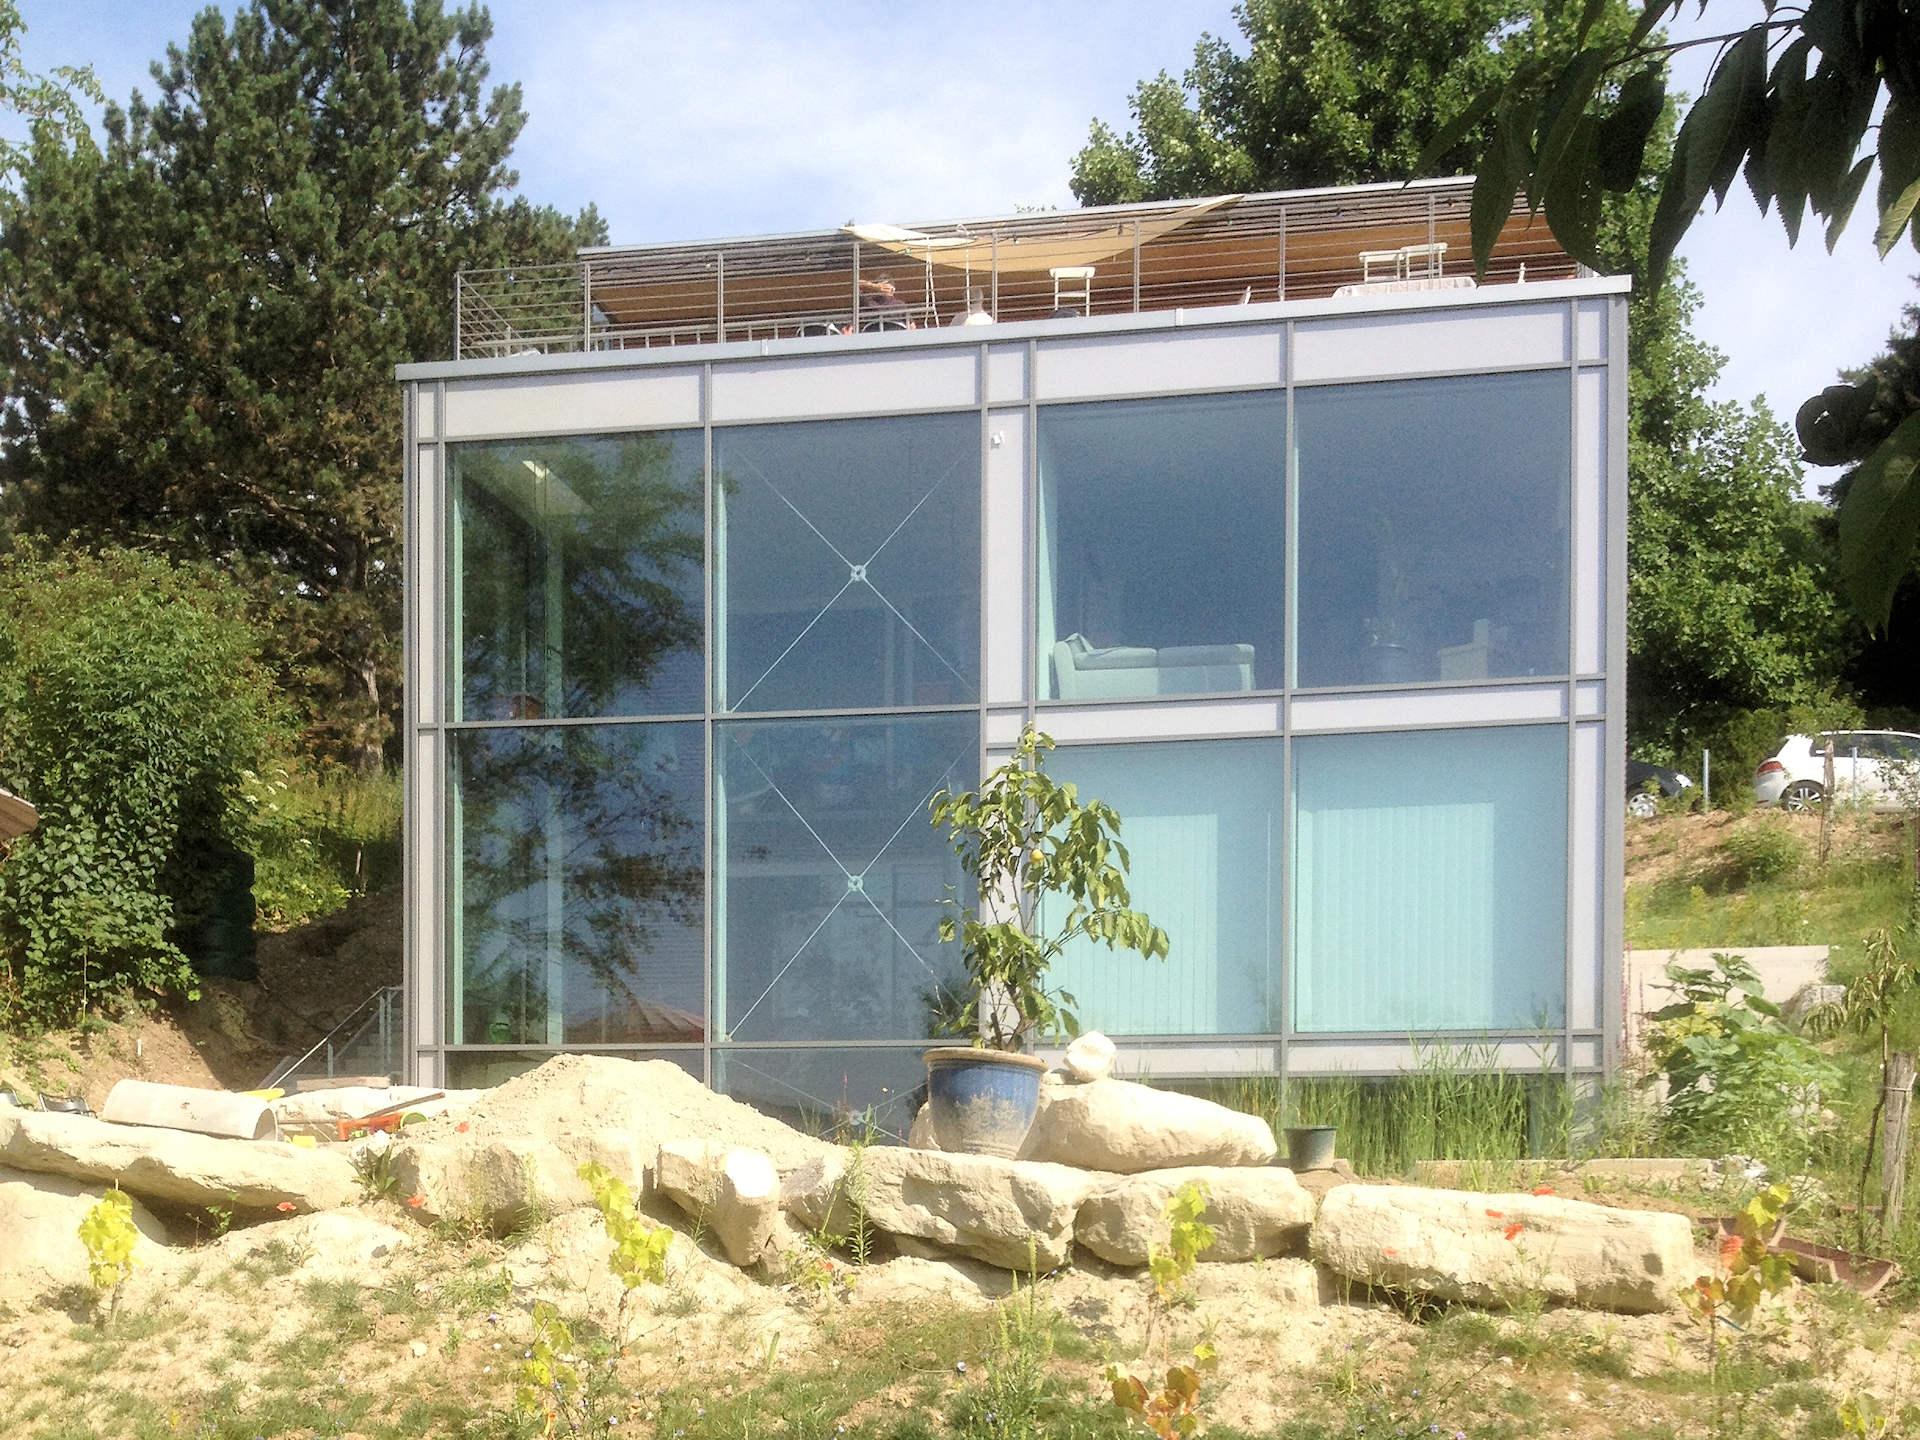 individuelles Holzhaus am Hang, Glasfront, Dachterrasse